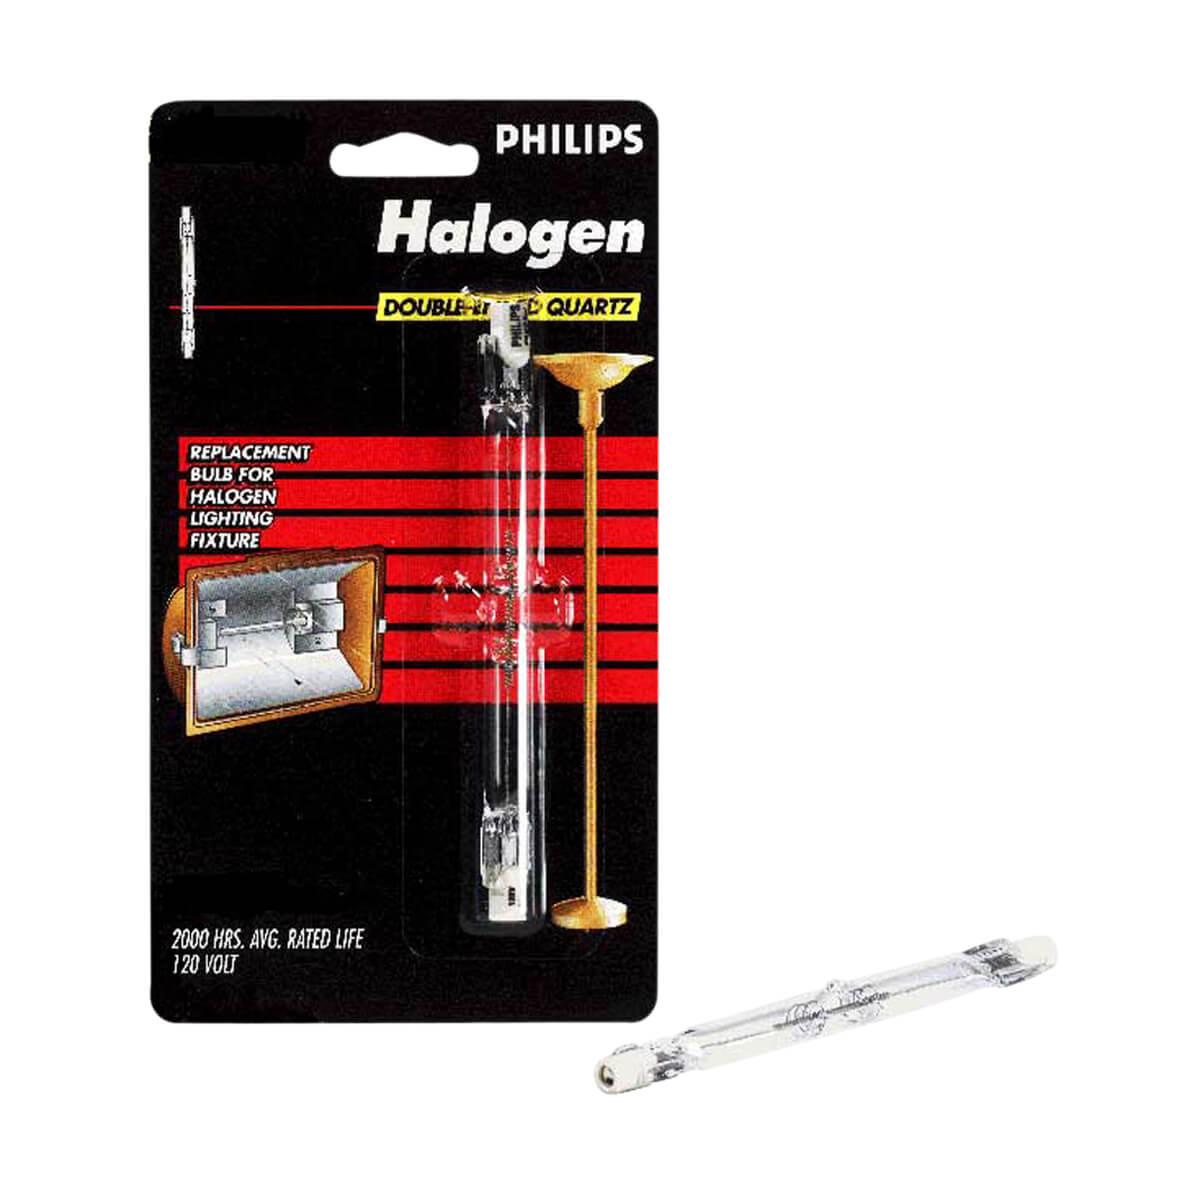 Philips Halogen Tube 500W T3 Quartz 119 mm - 2 pack